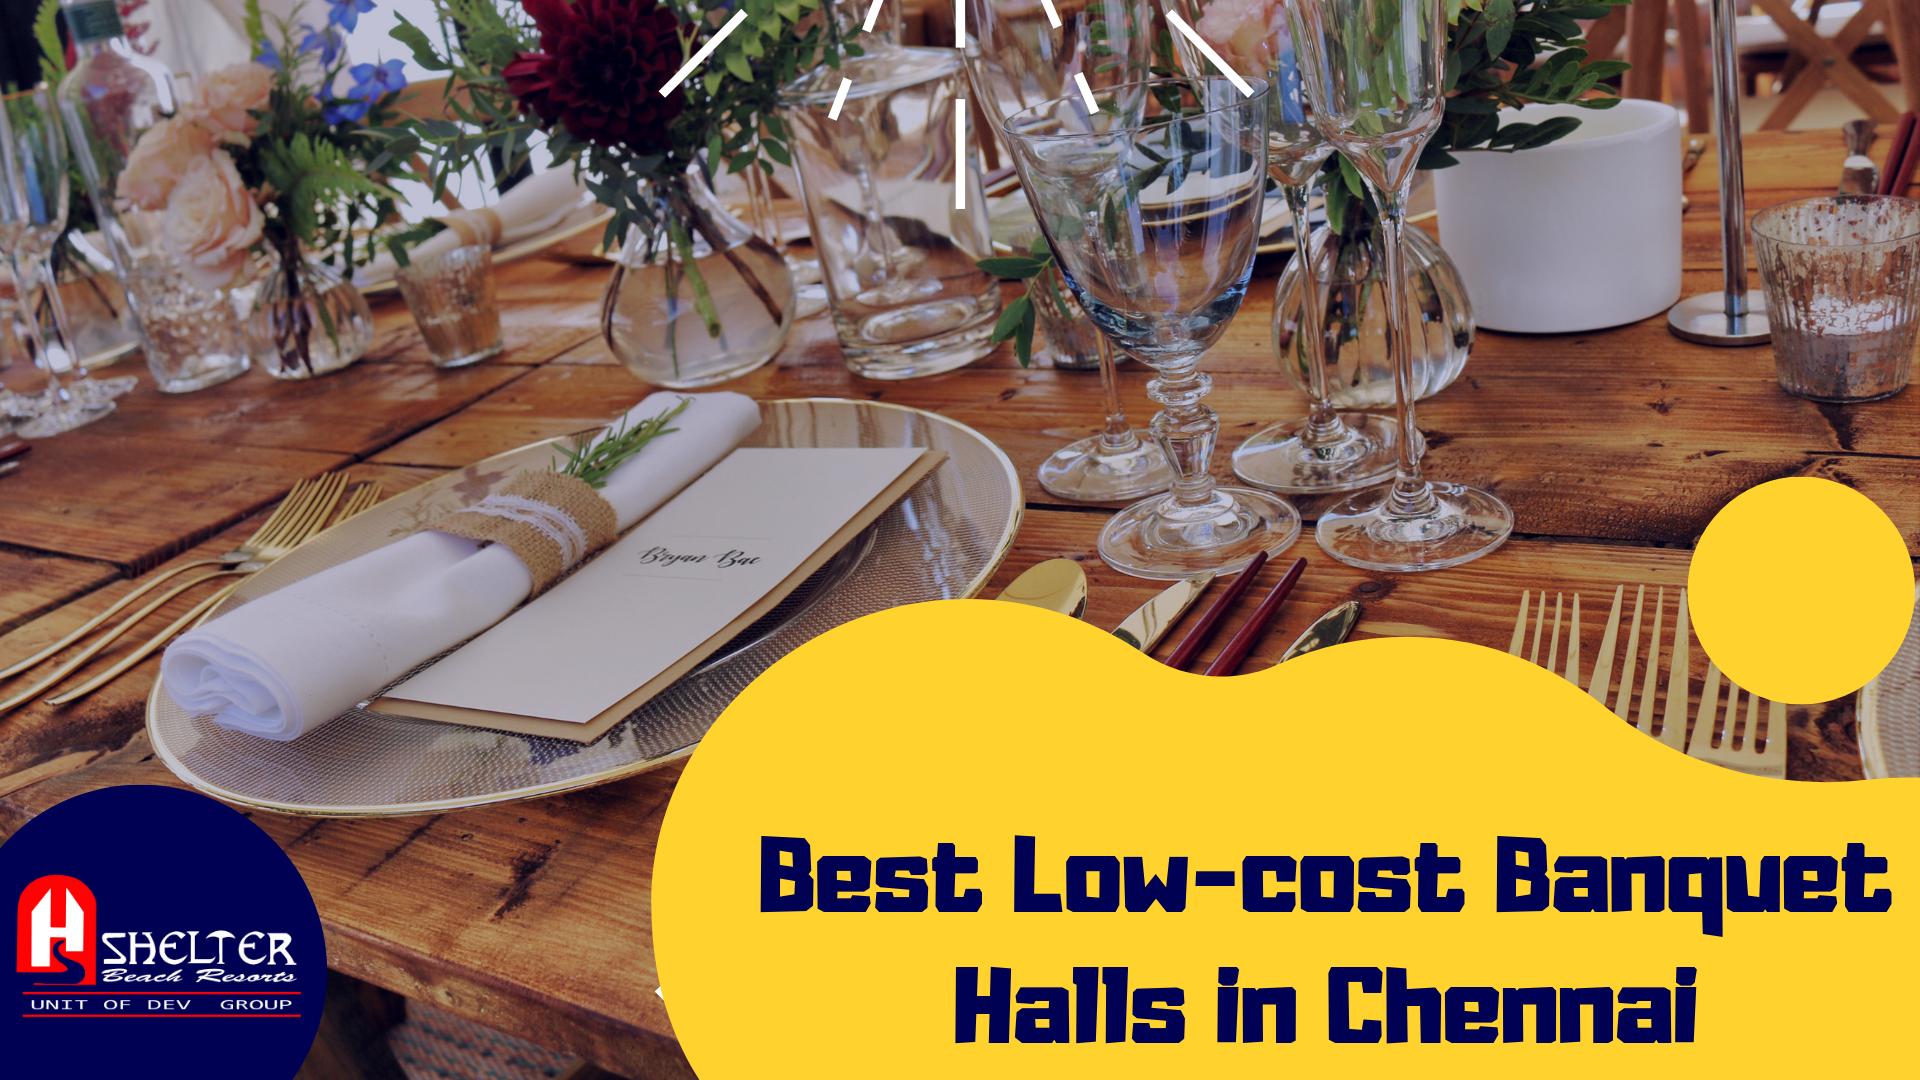 Best Low-cost Banquet Halls in Chennai